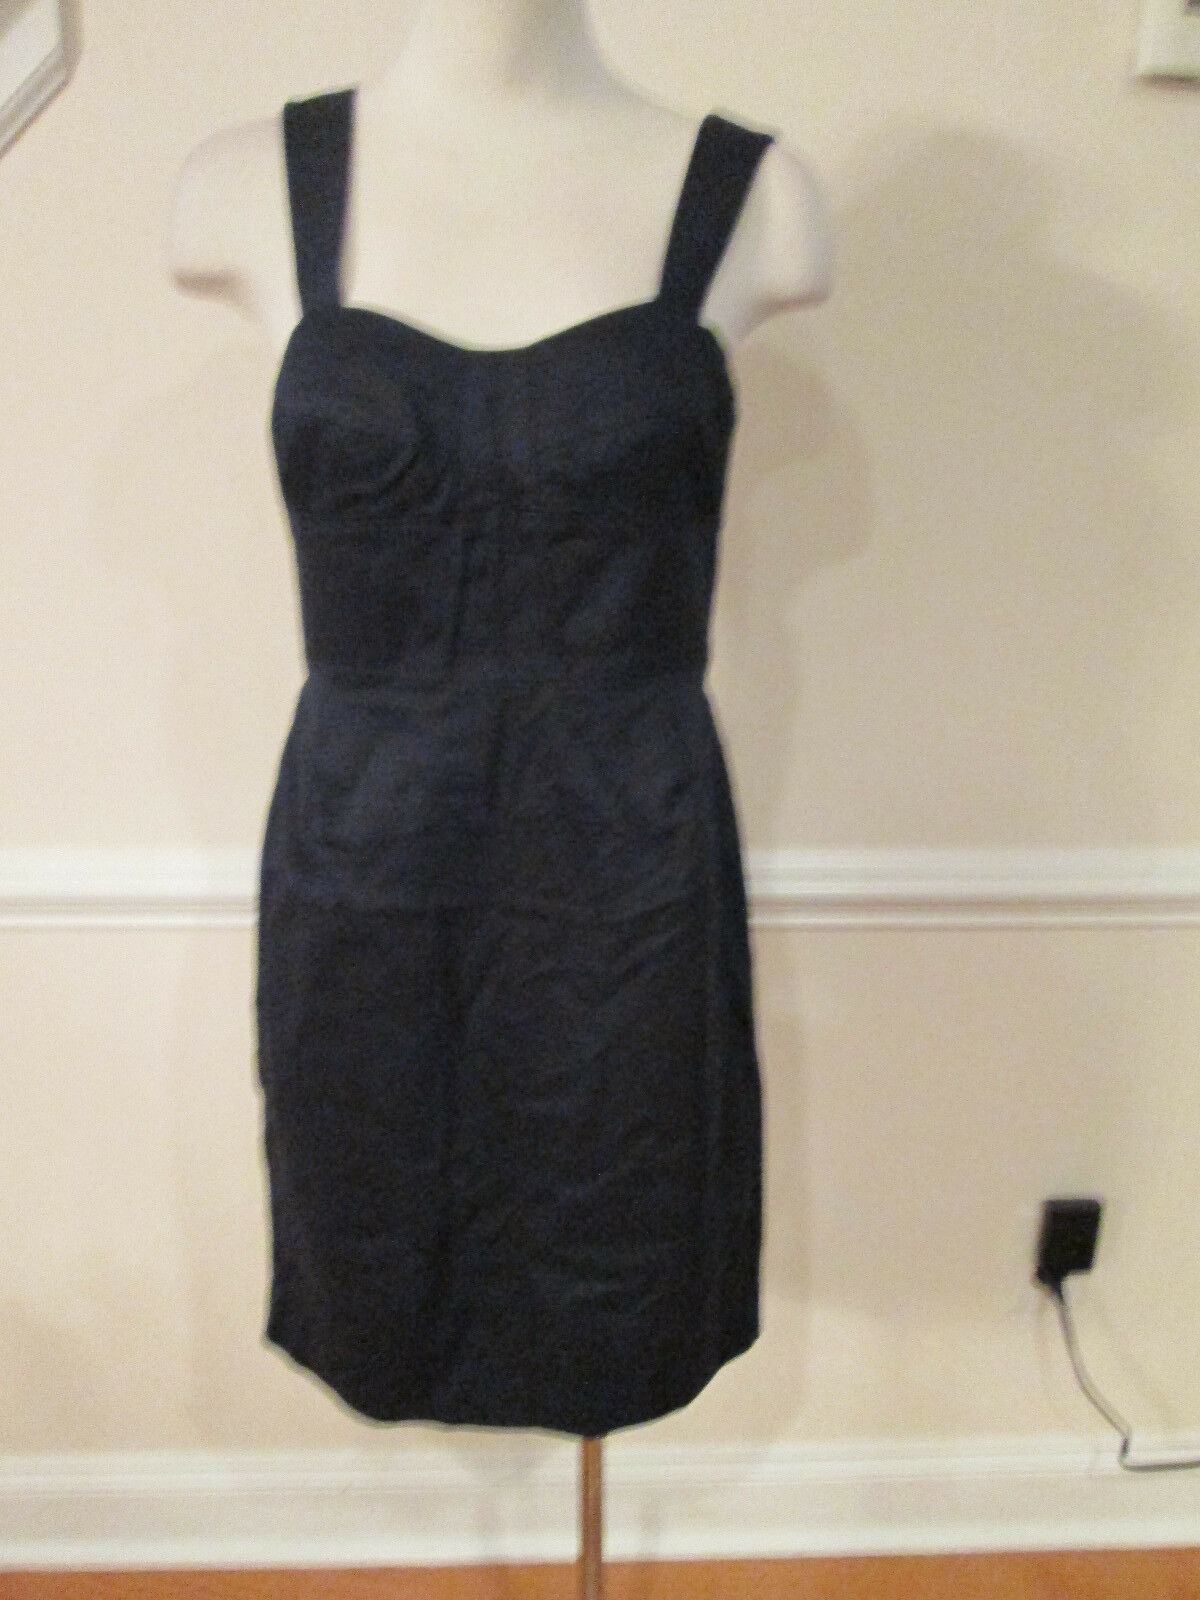 Boston proper seamed stretch sheath dress 4 indigo new